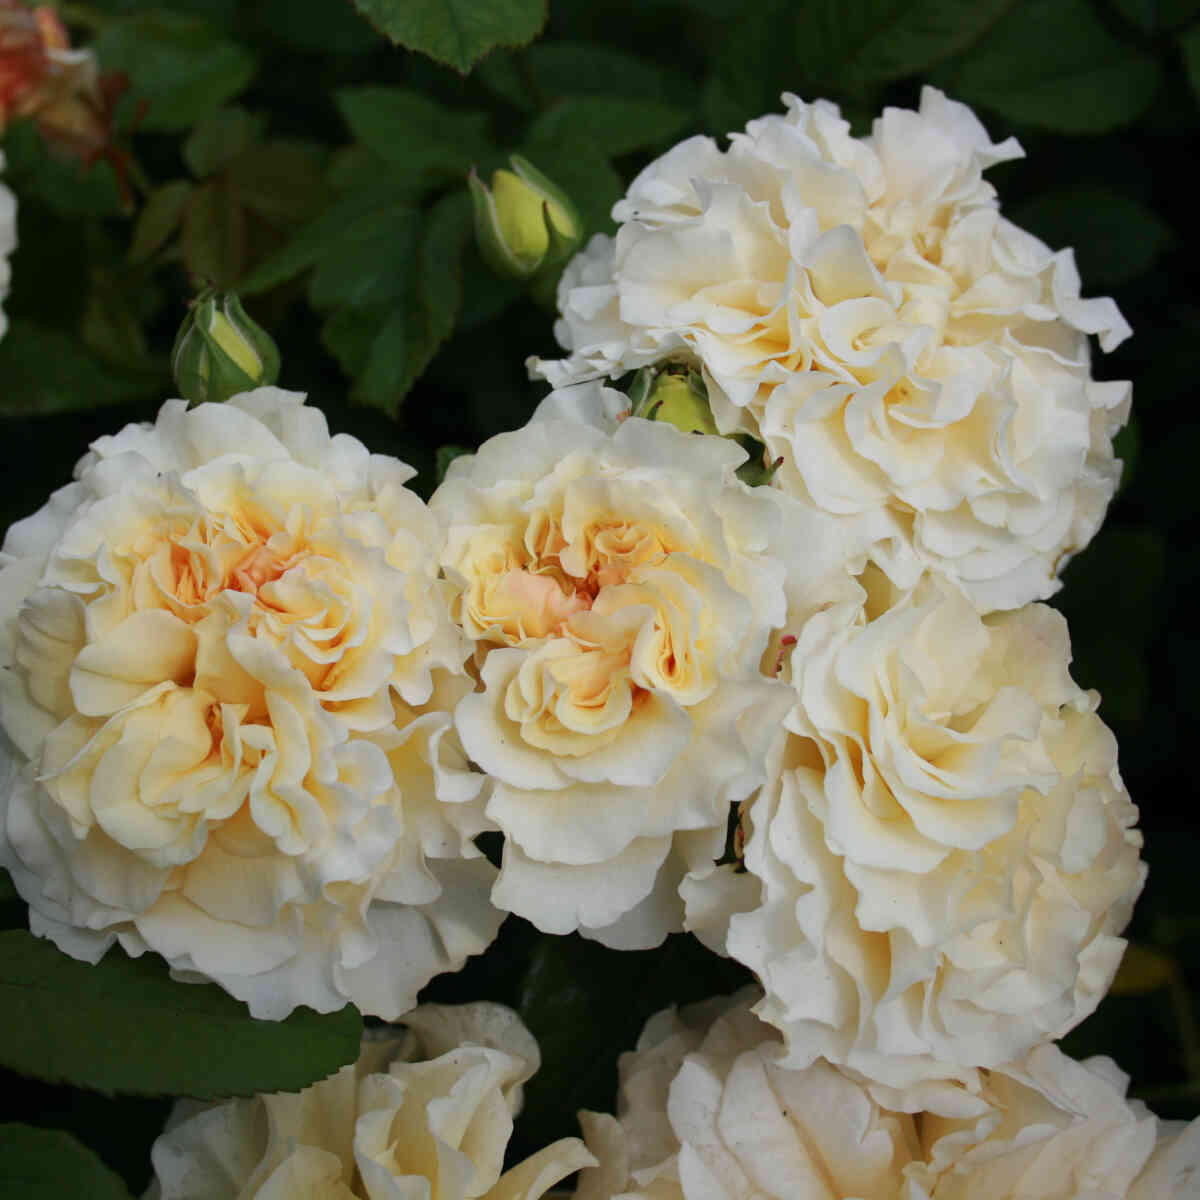 Rose 'Comtessa'